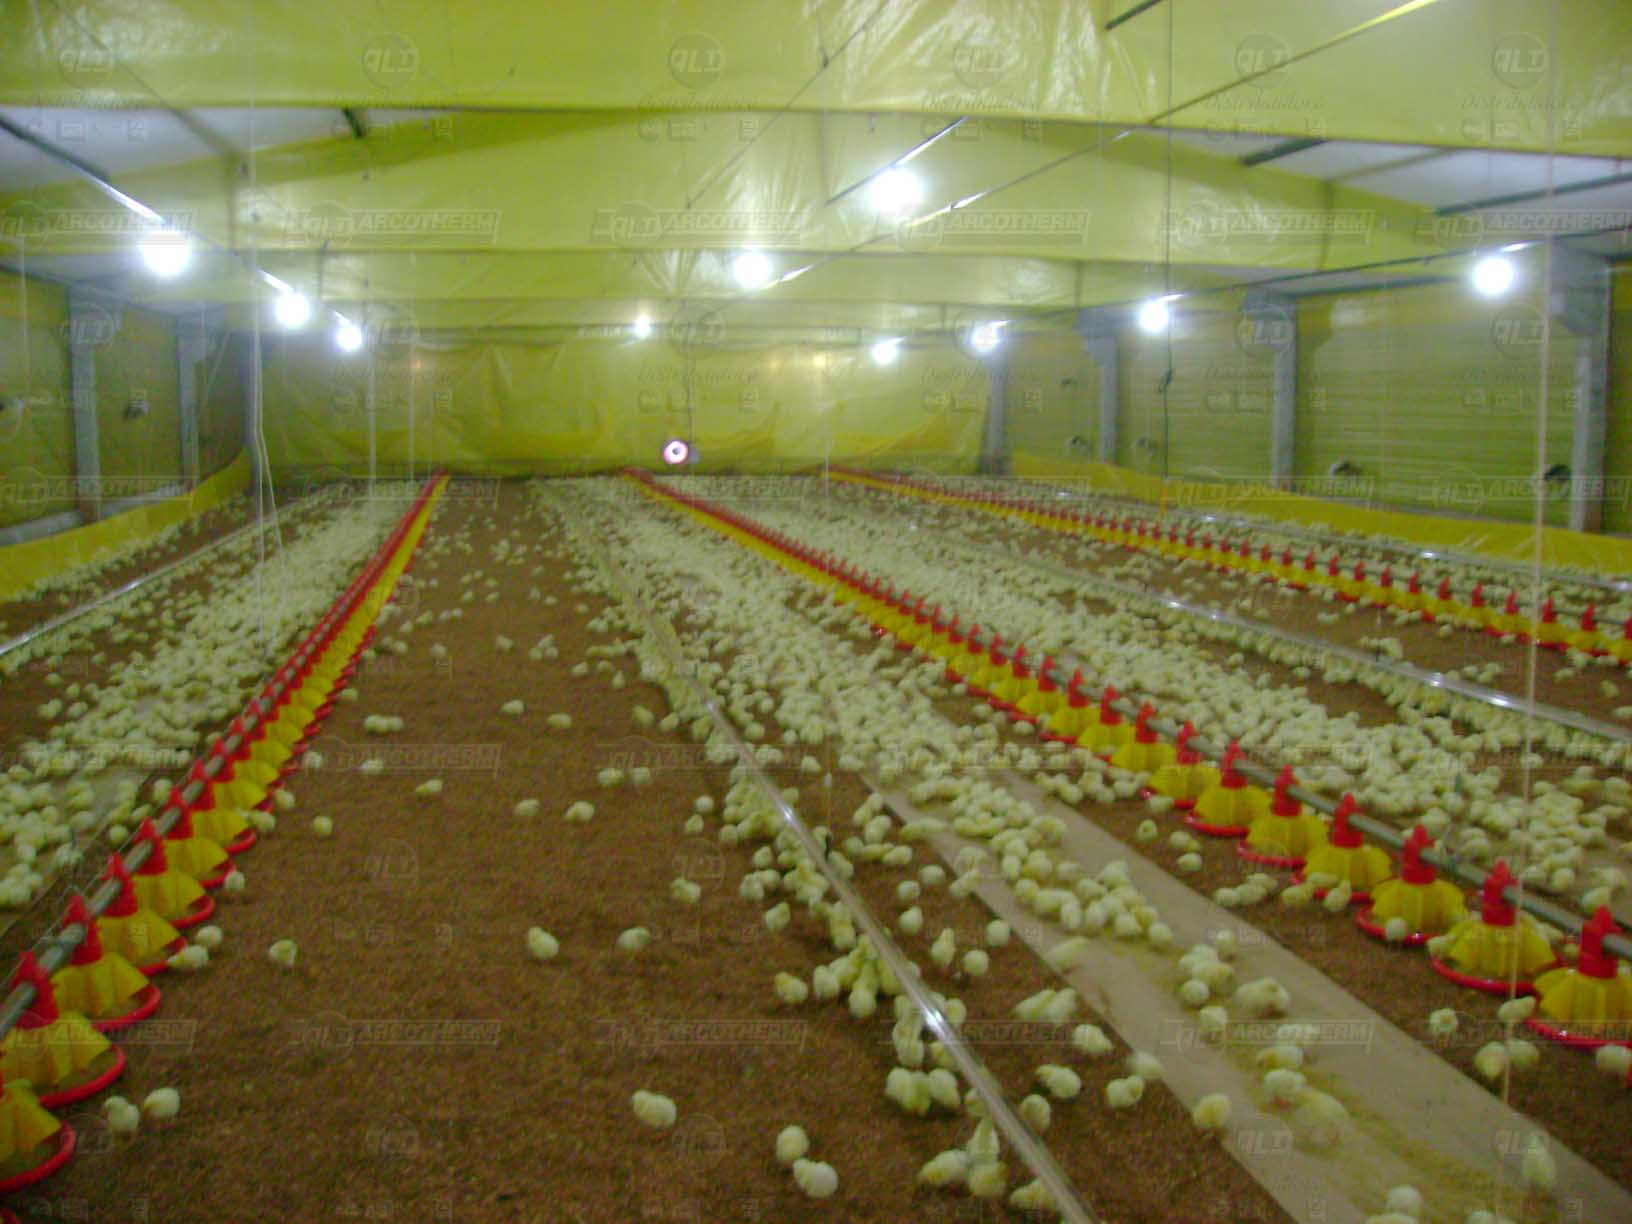 Granja - galpao frango de corte - aquecedor - gerador de ar quente - arcotherm- 5